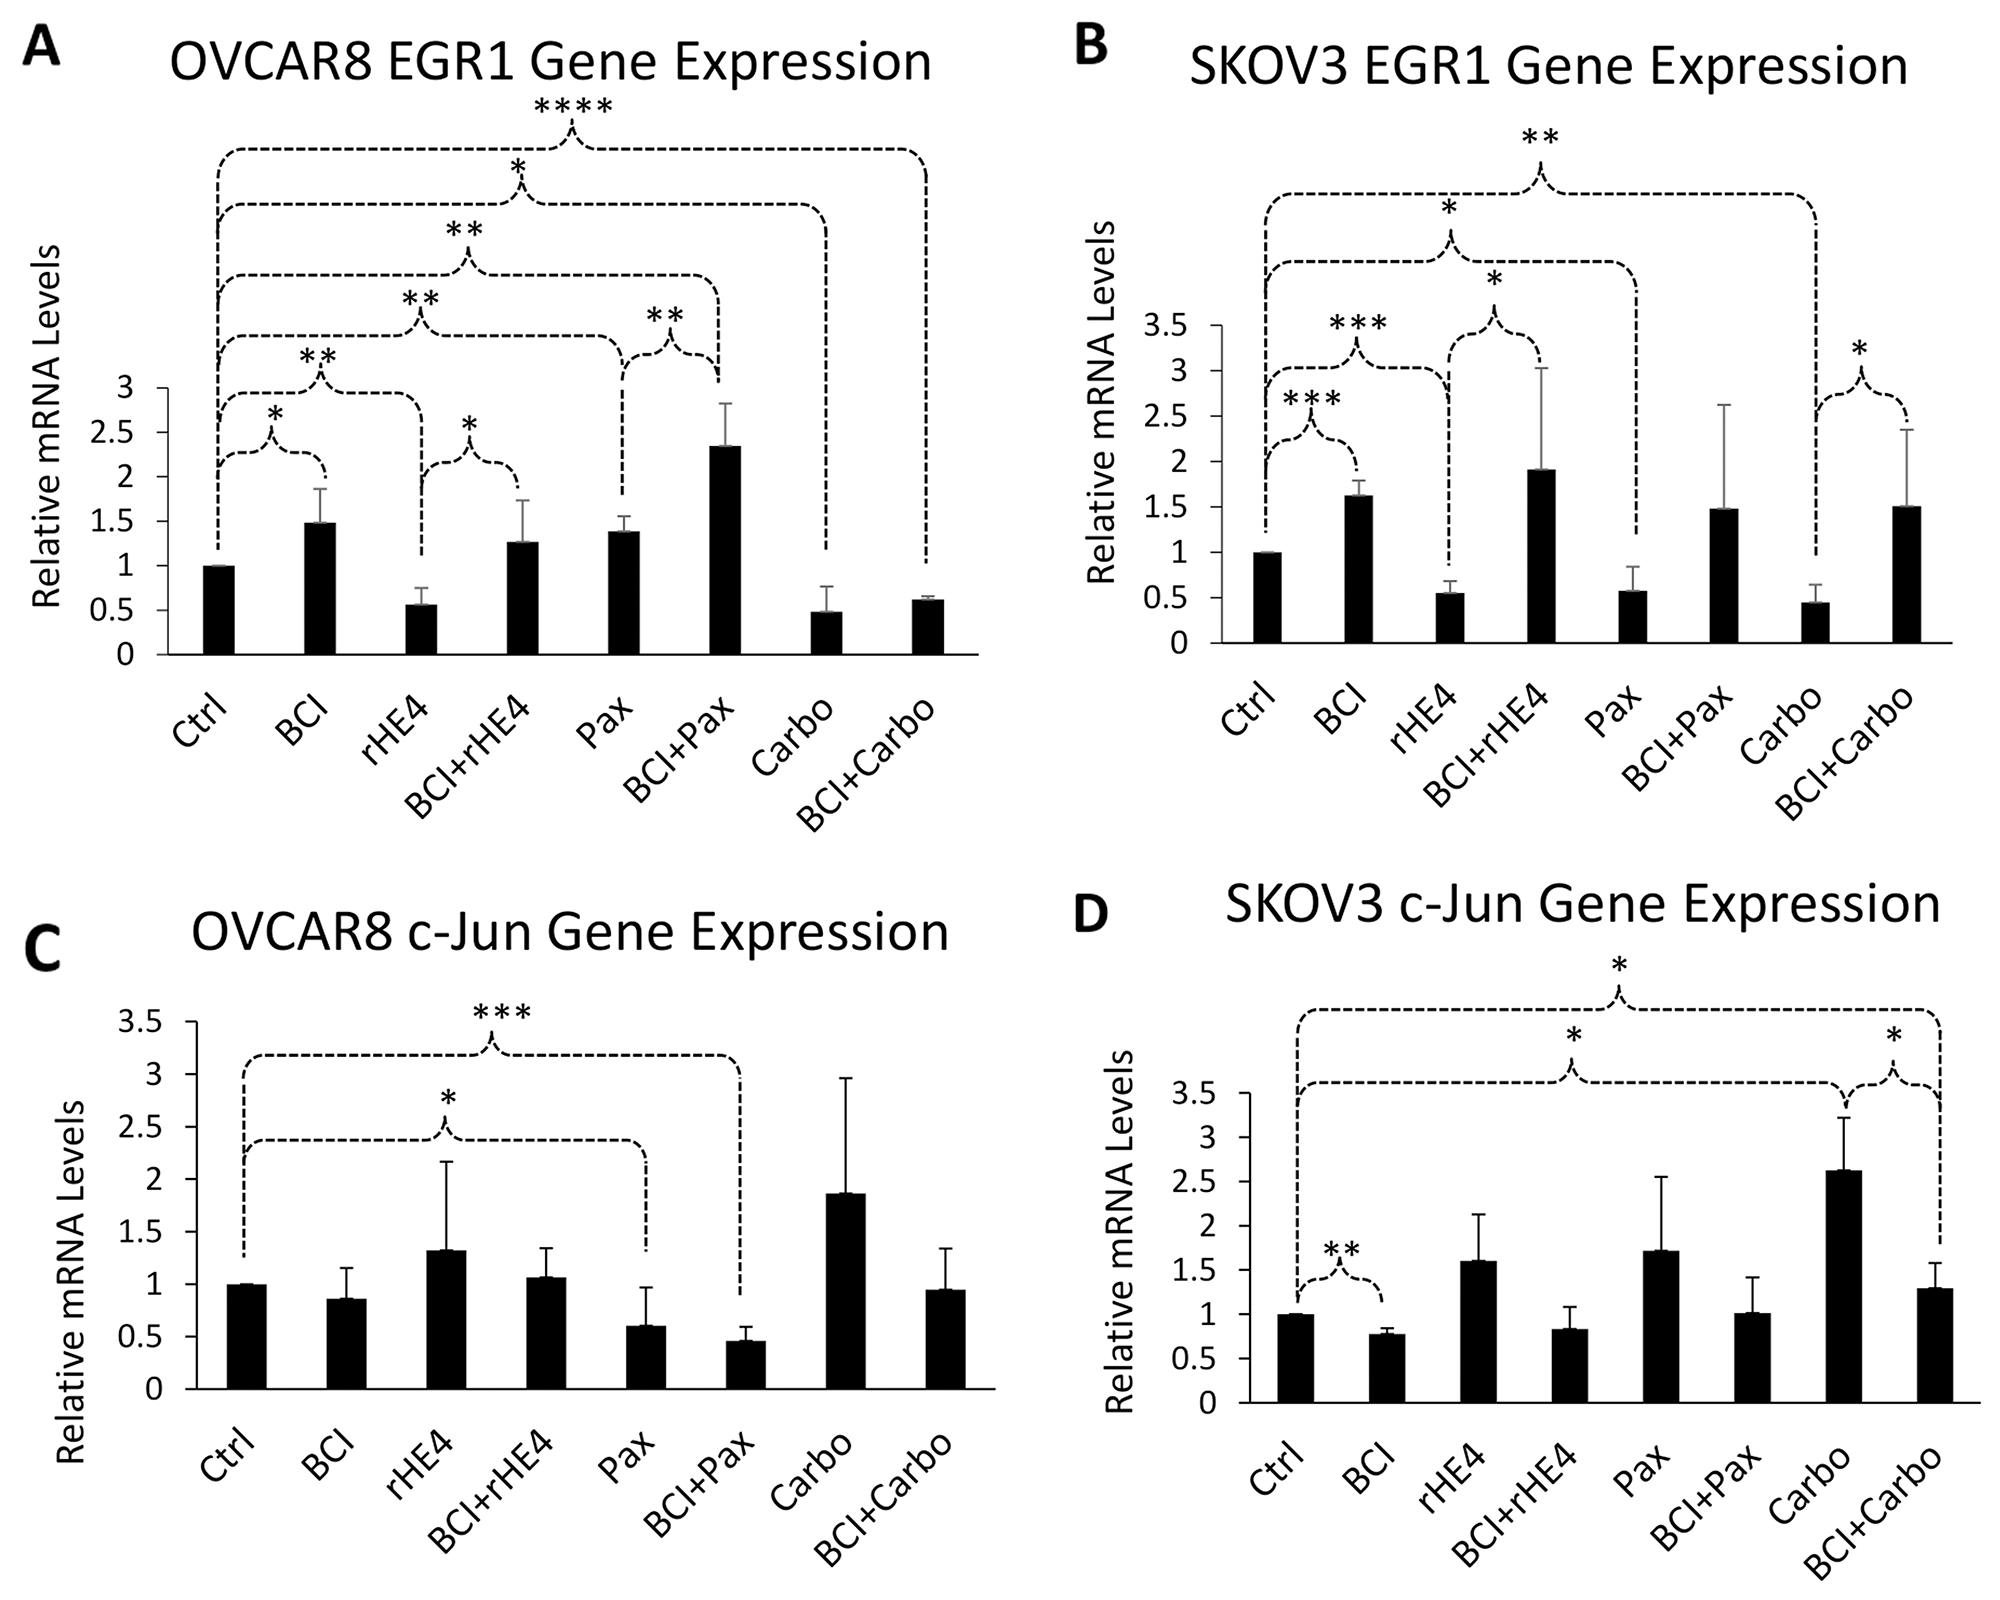 DUSP6 inhibition alters expression of ERK pathway responsive genes.